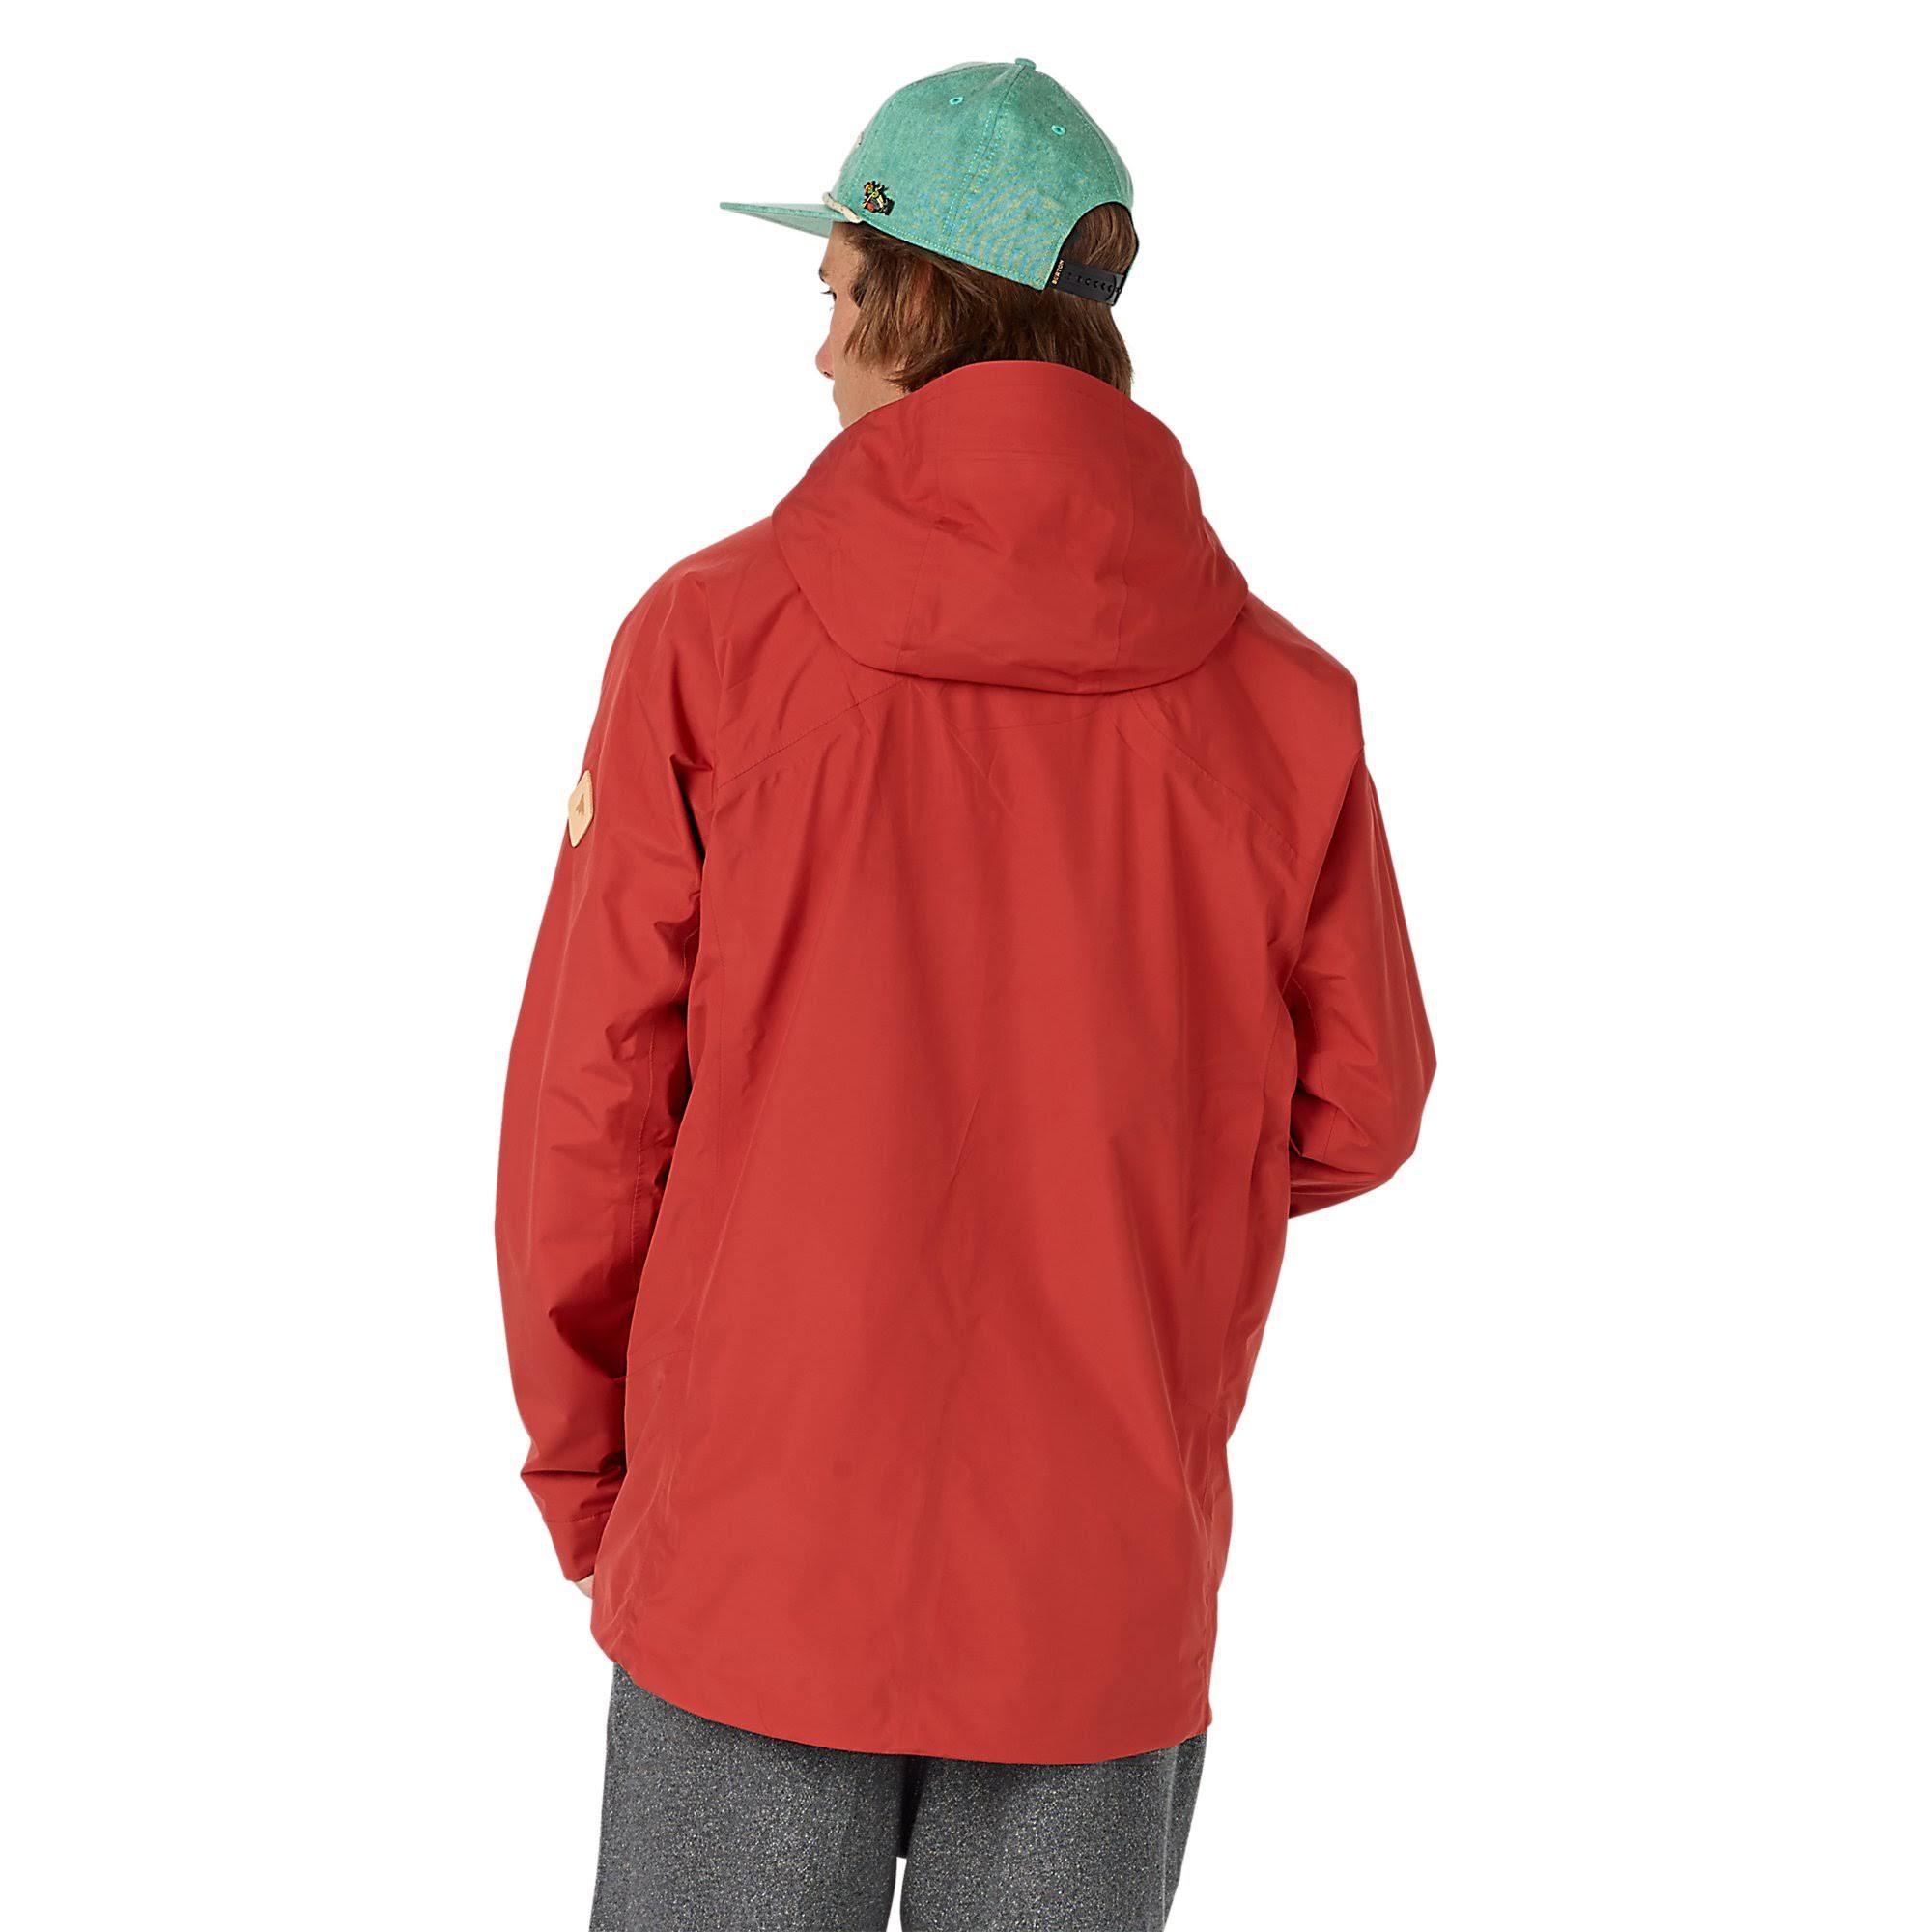 2l Packrite Para Gore Burton Hombre Jacket tex Tandori M pwBWZqf